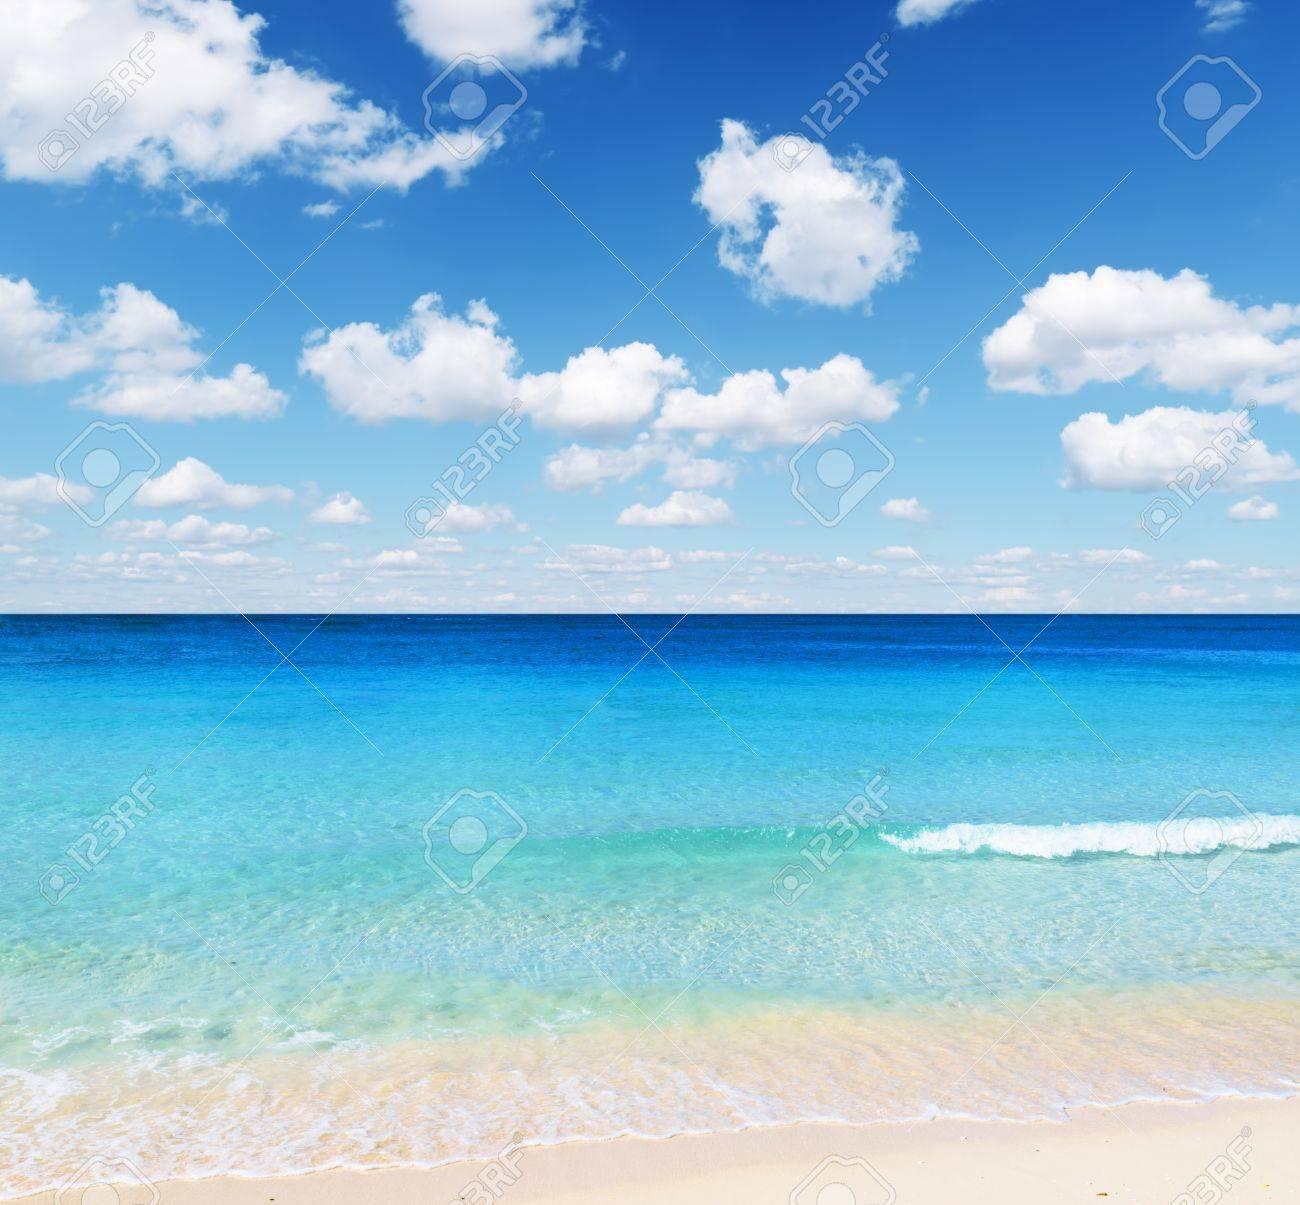 Tropical beach. Sky and sea. Stock Photo - 12322477